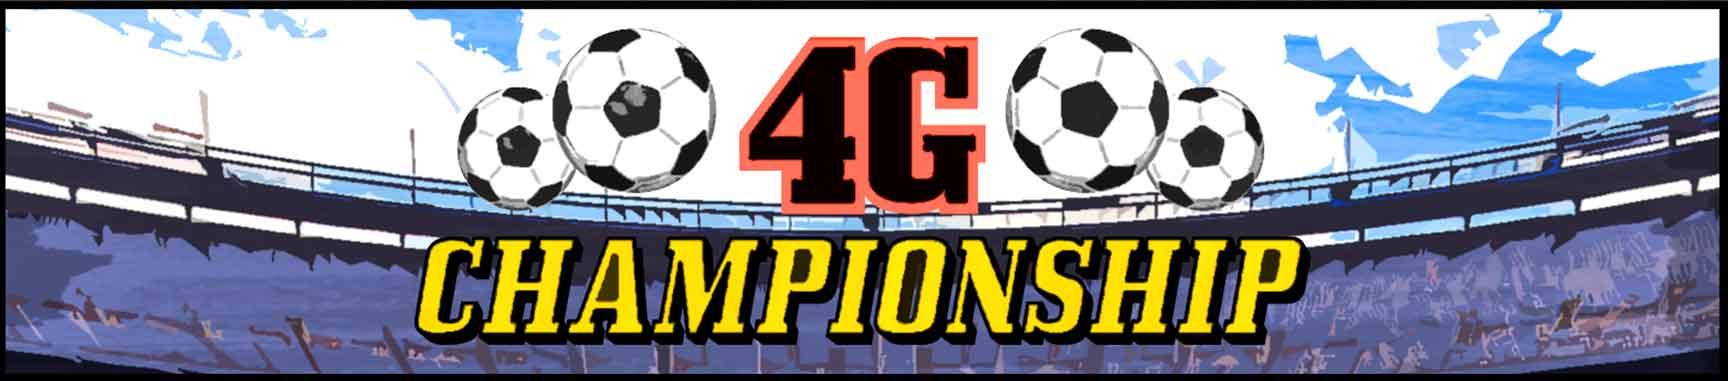 4G Championship league banner